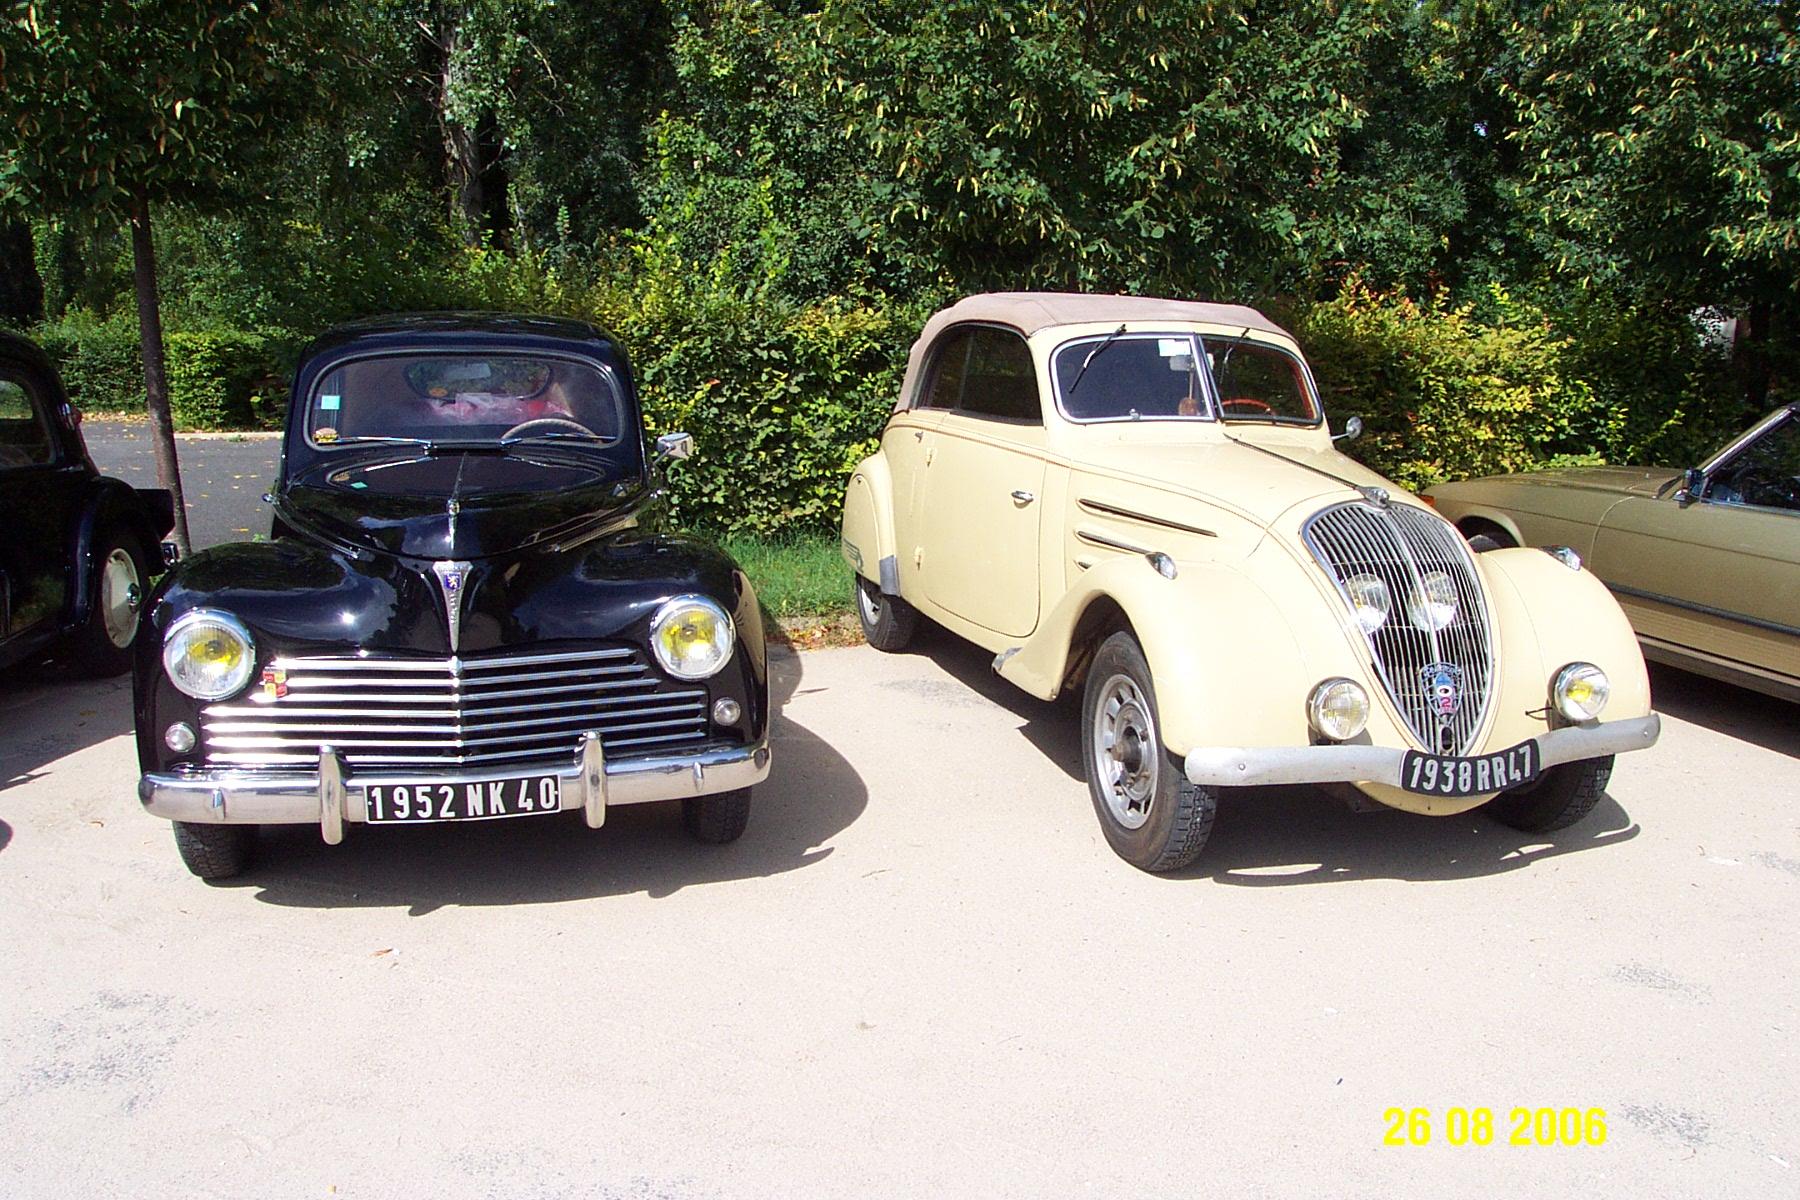 Peugeot 203A 1952 & 402 Cabriolet